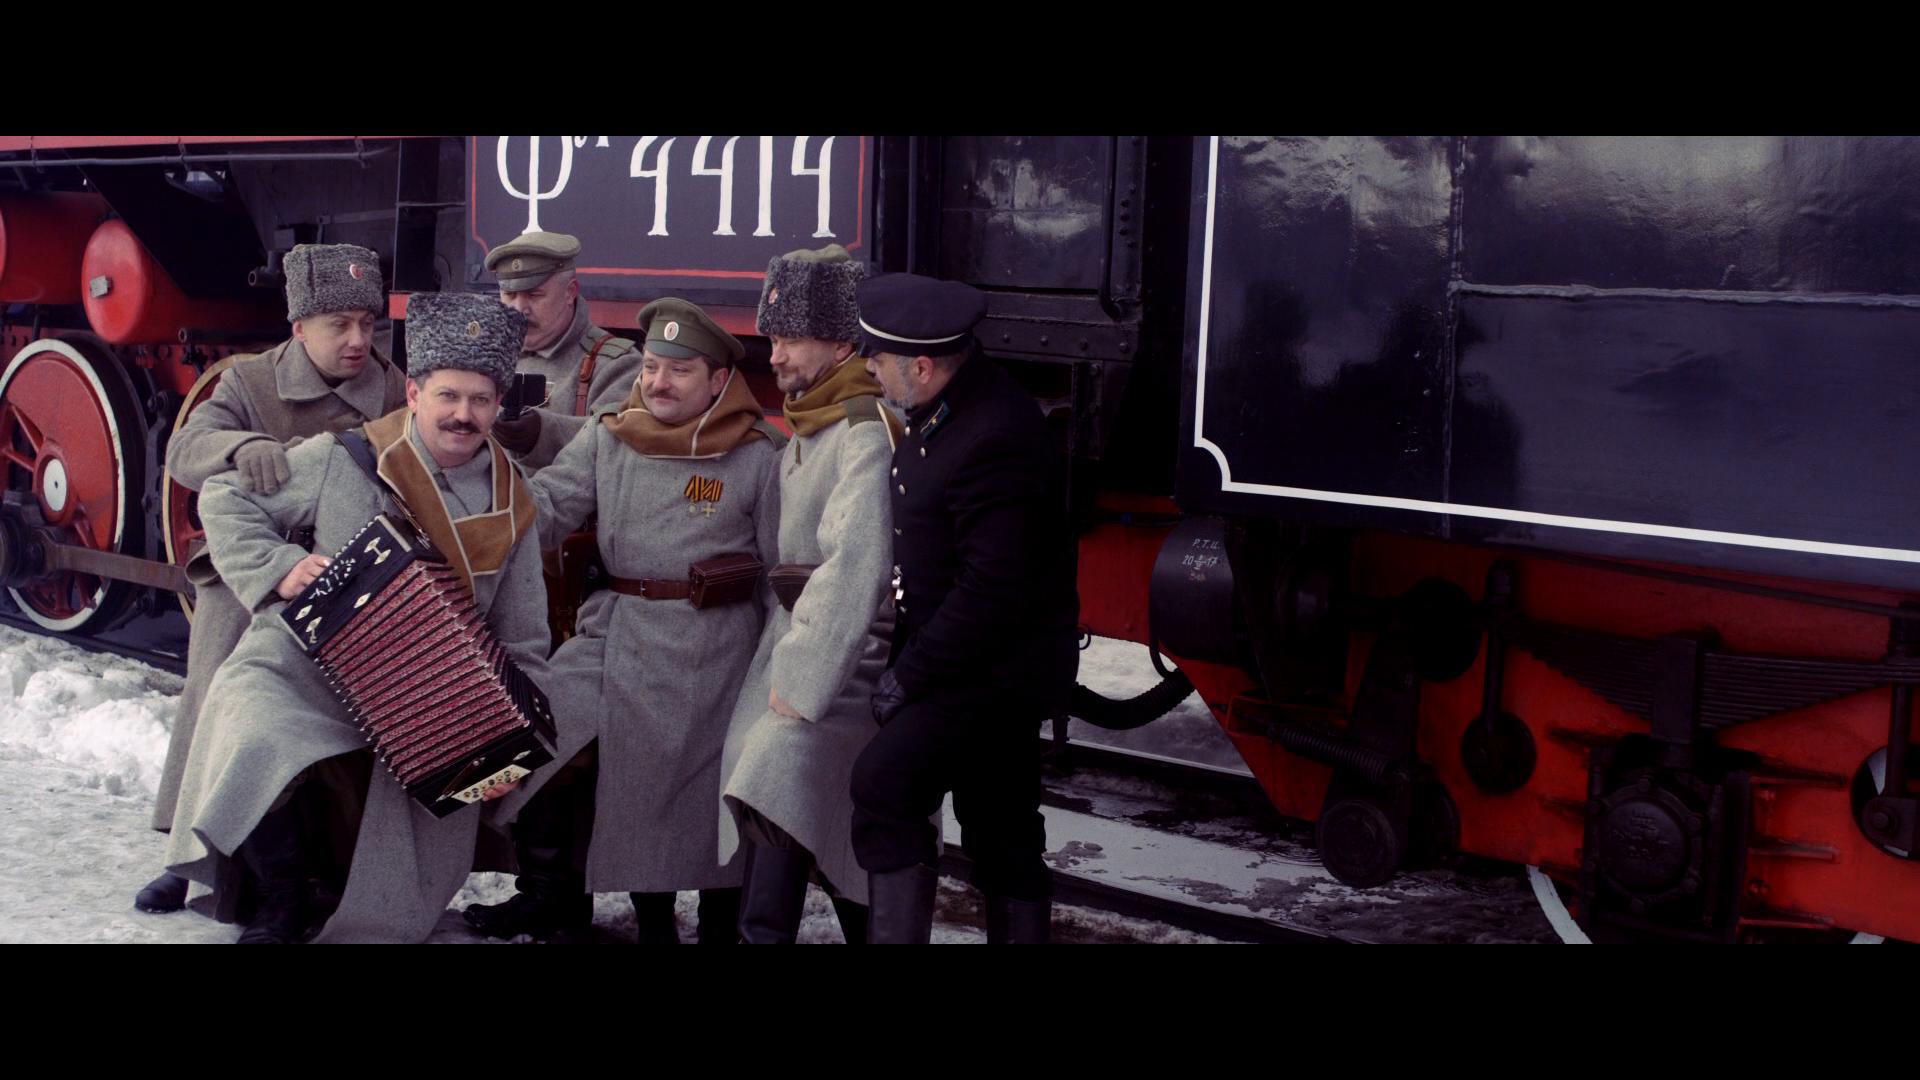 Thumbnail for #1917LIVE: Make selfie, not war